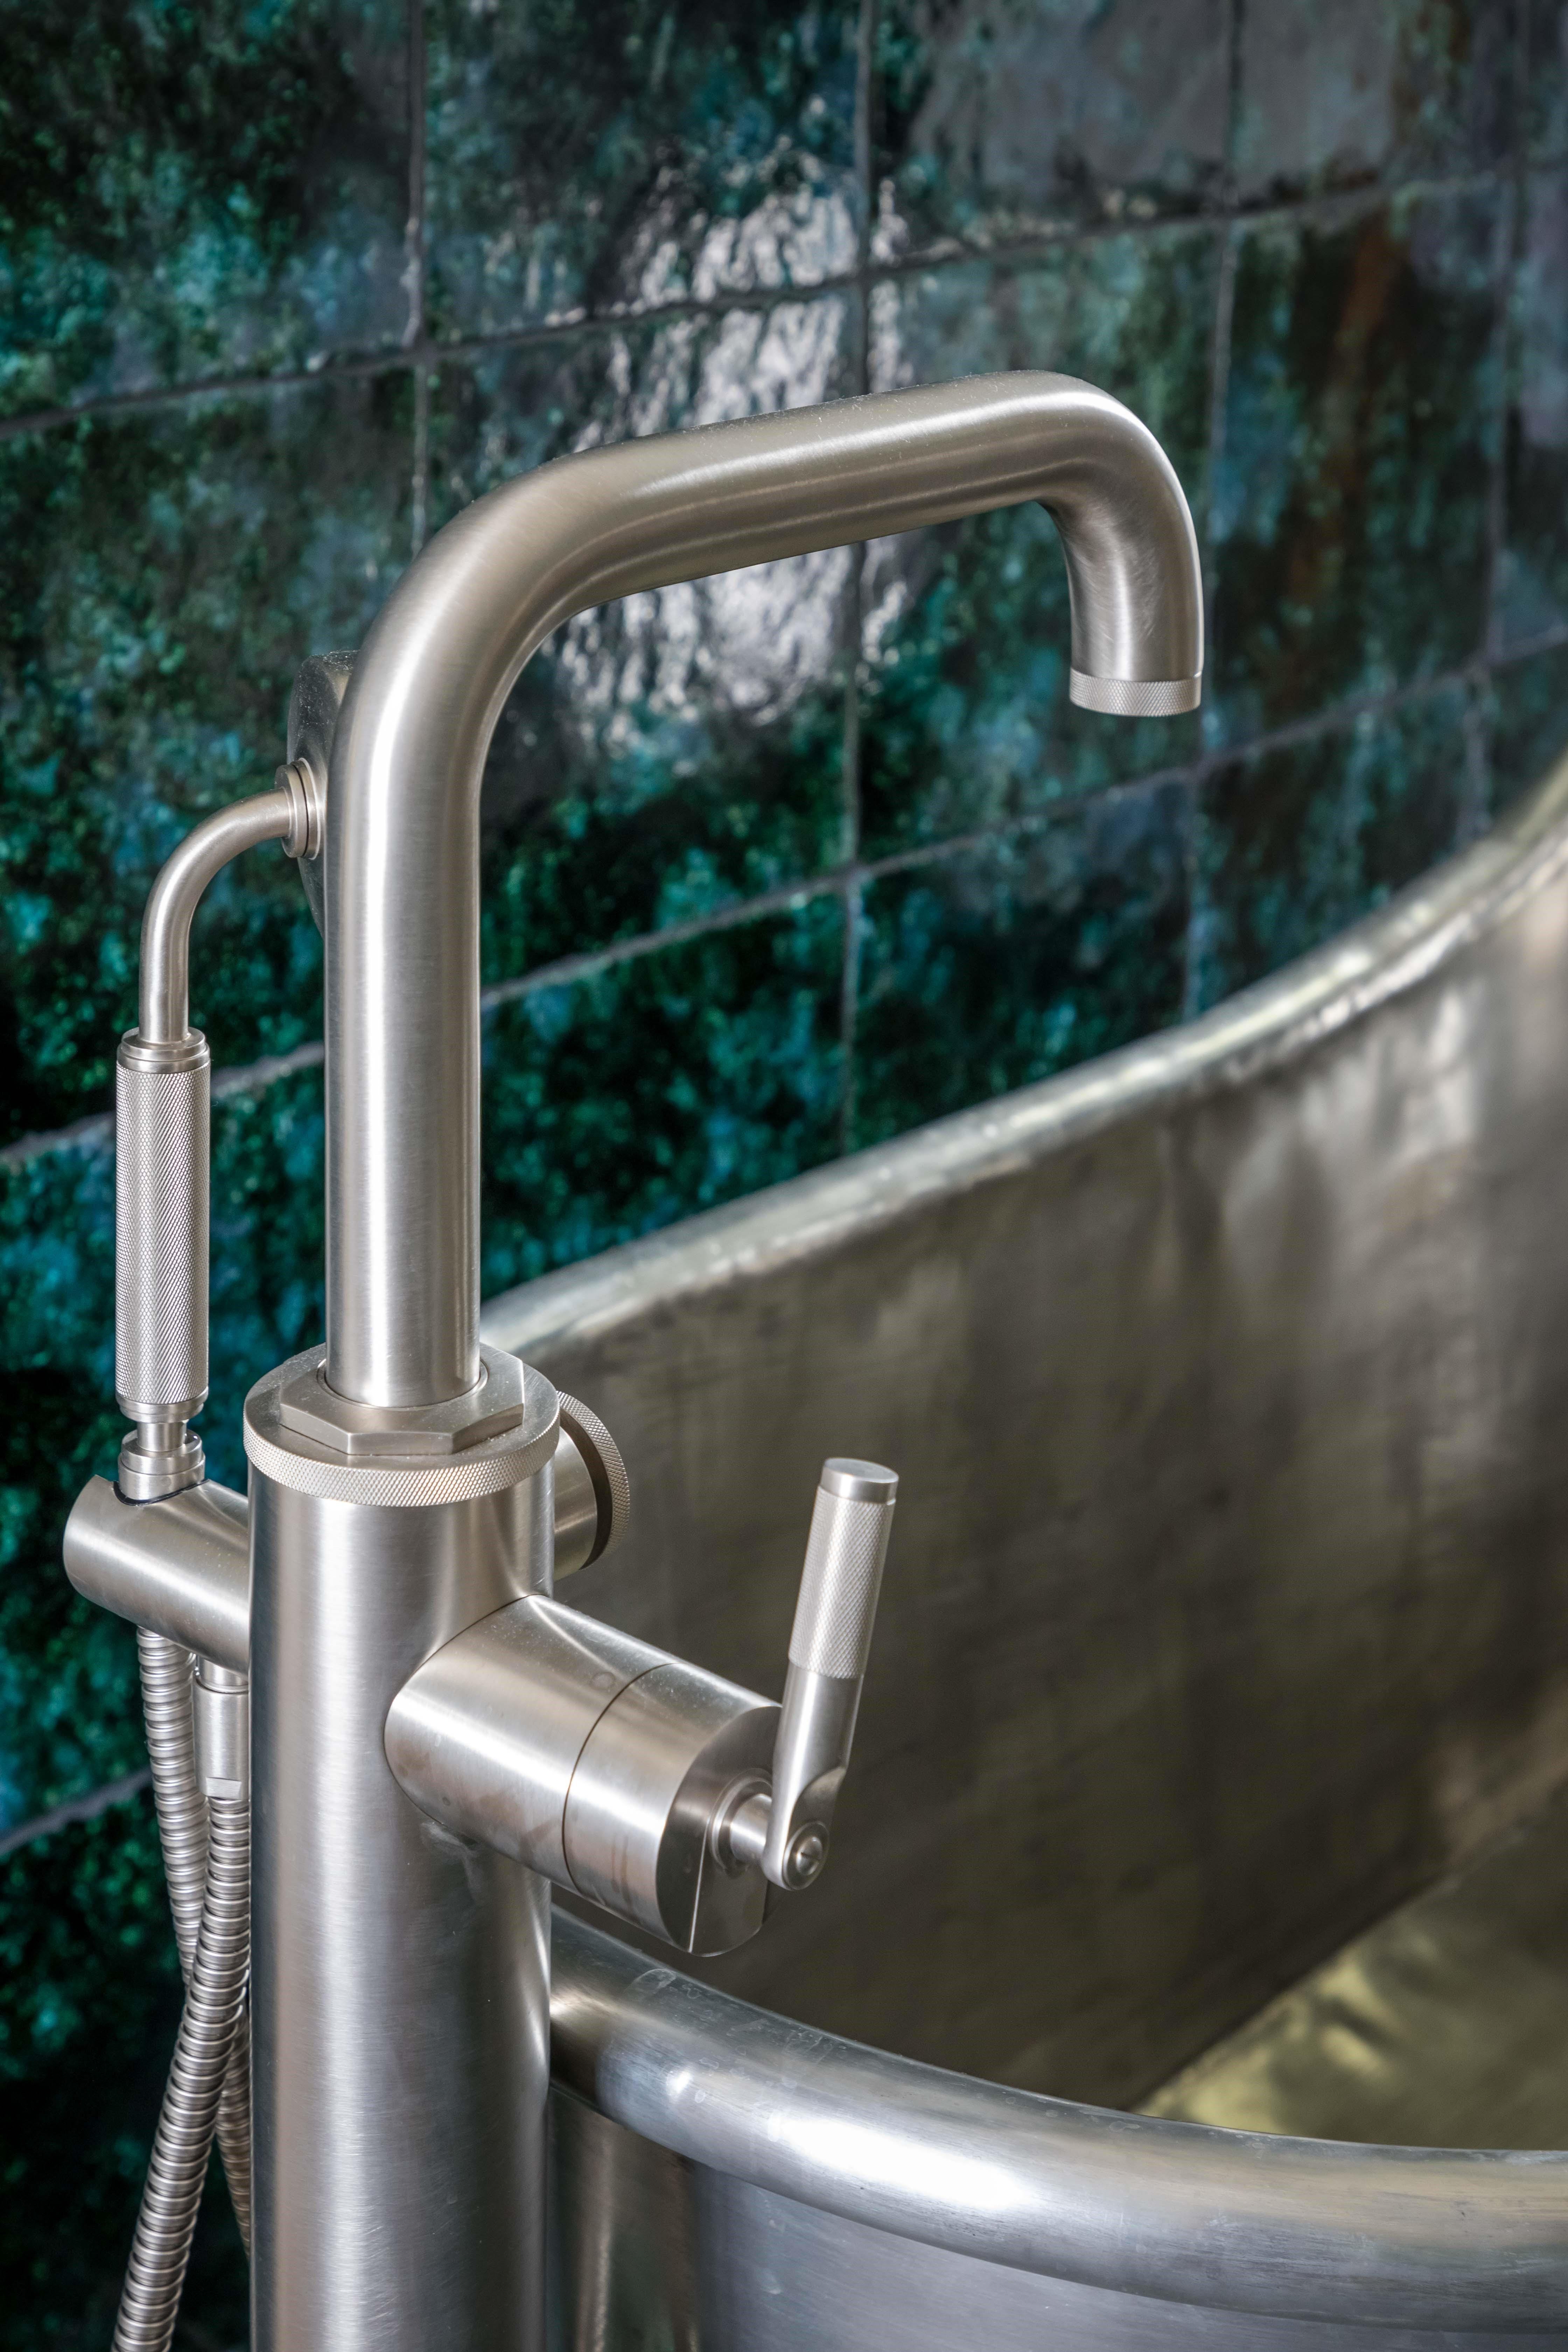 Samuel Heath Landmark Industrial brassware. Freestanding bath shower filler in a brushed nickel finish.